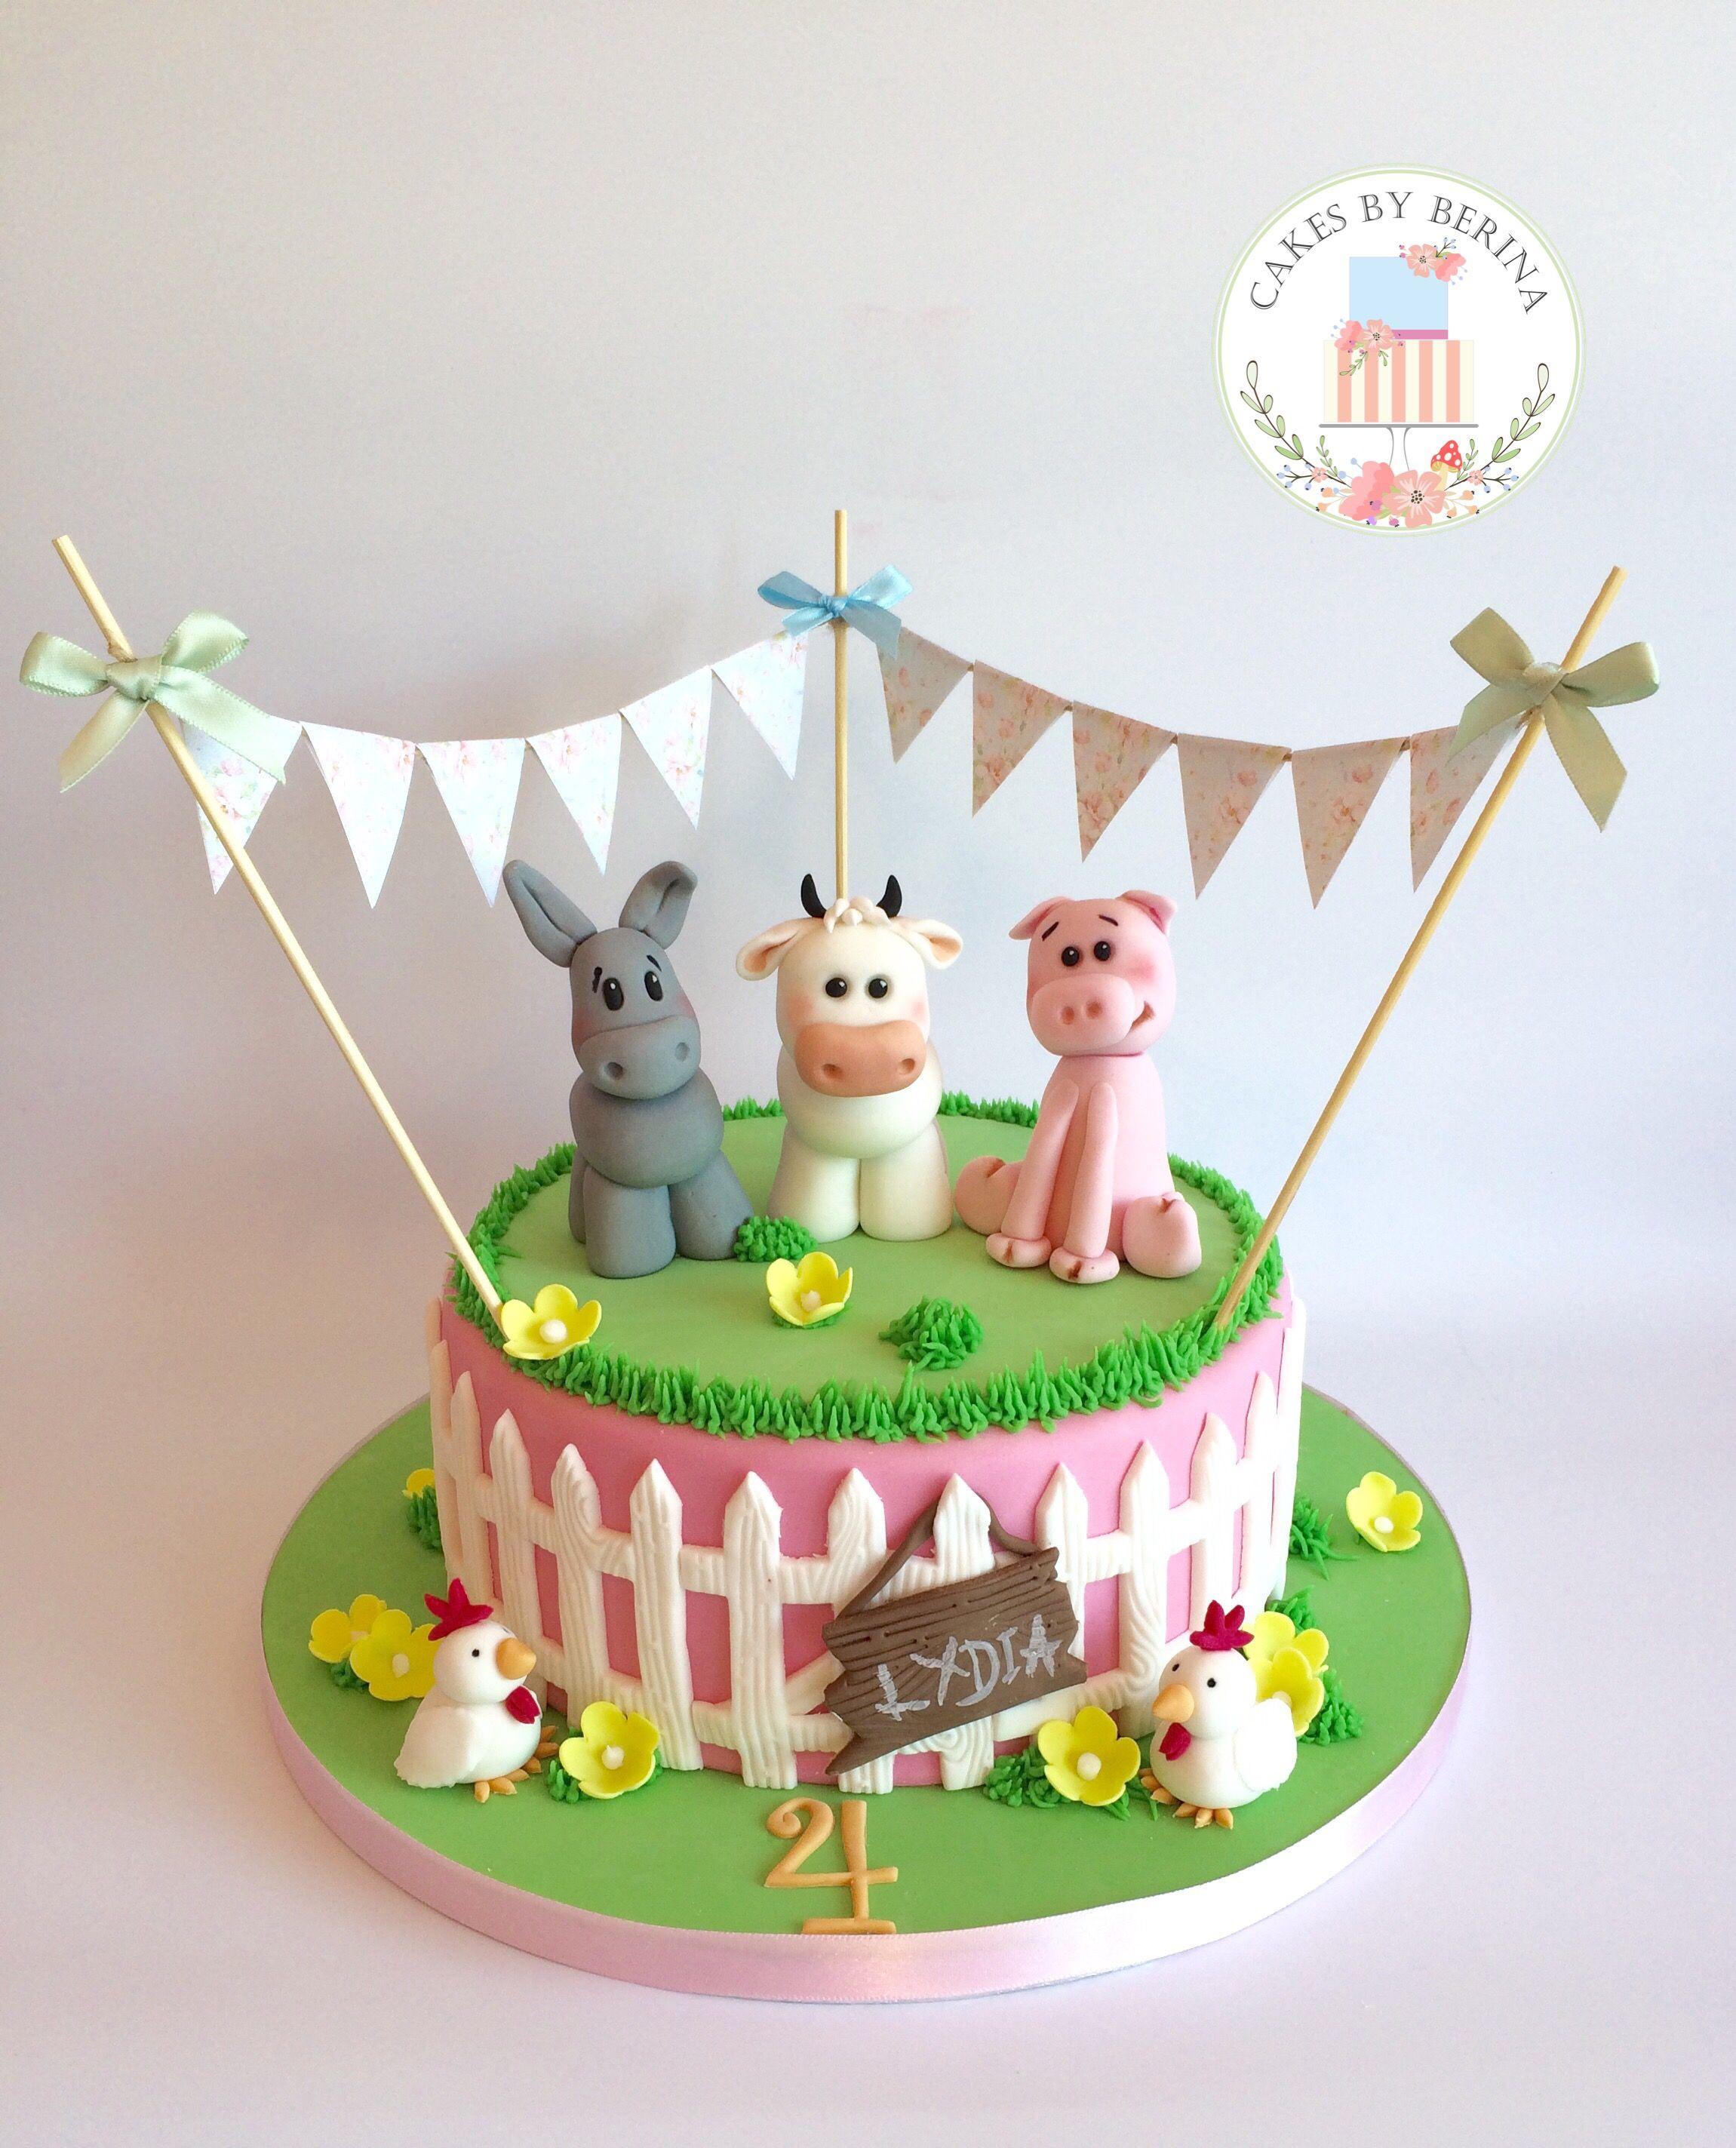 Girly Farm Animals Birthday Cake With Edible Cow Donkey